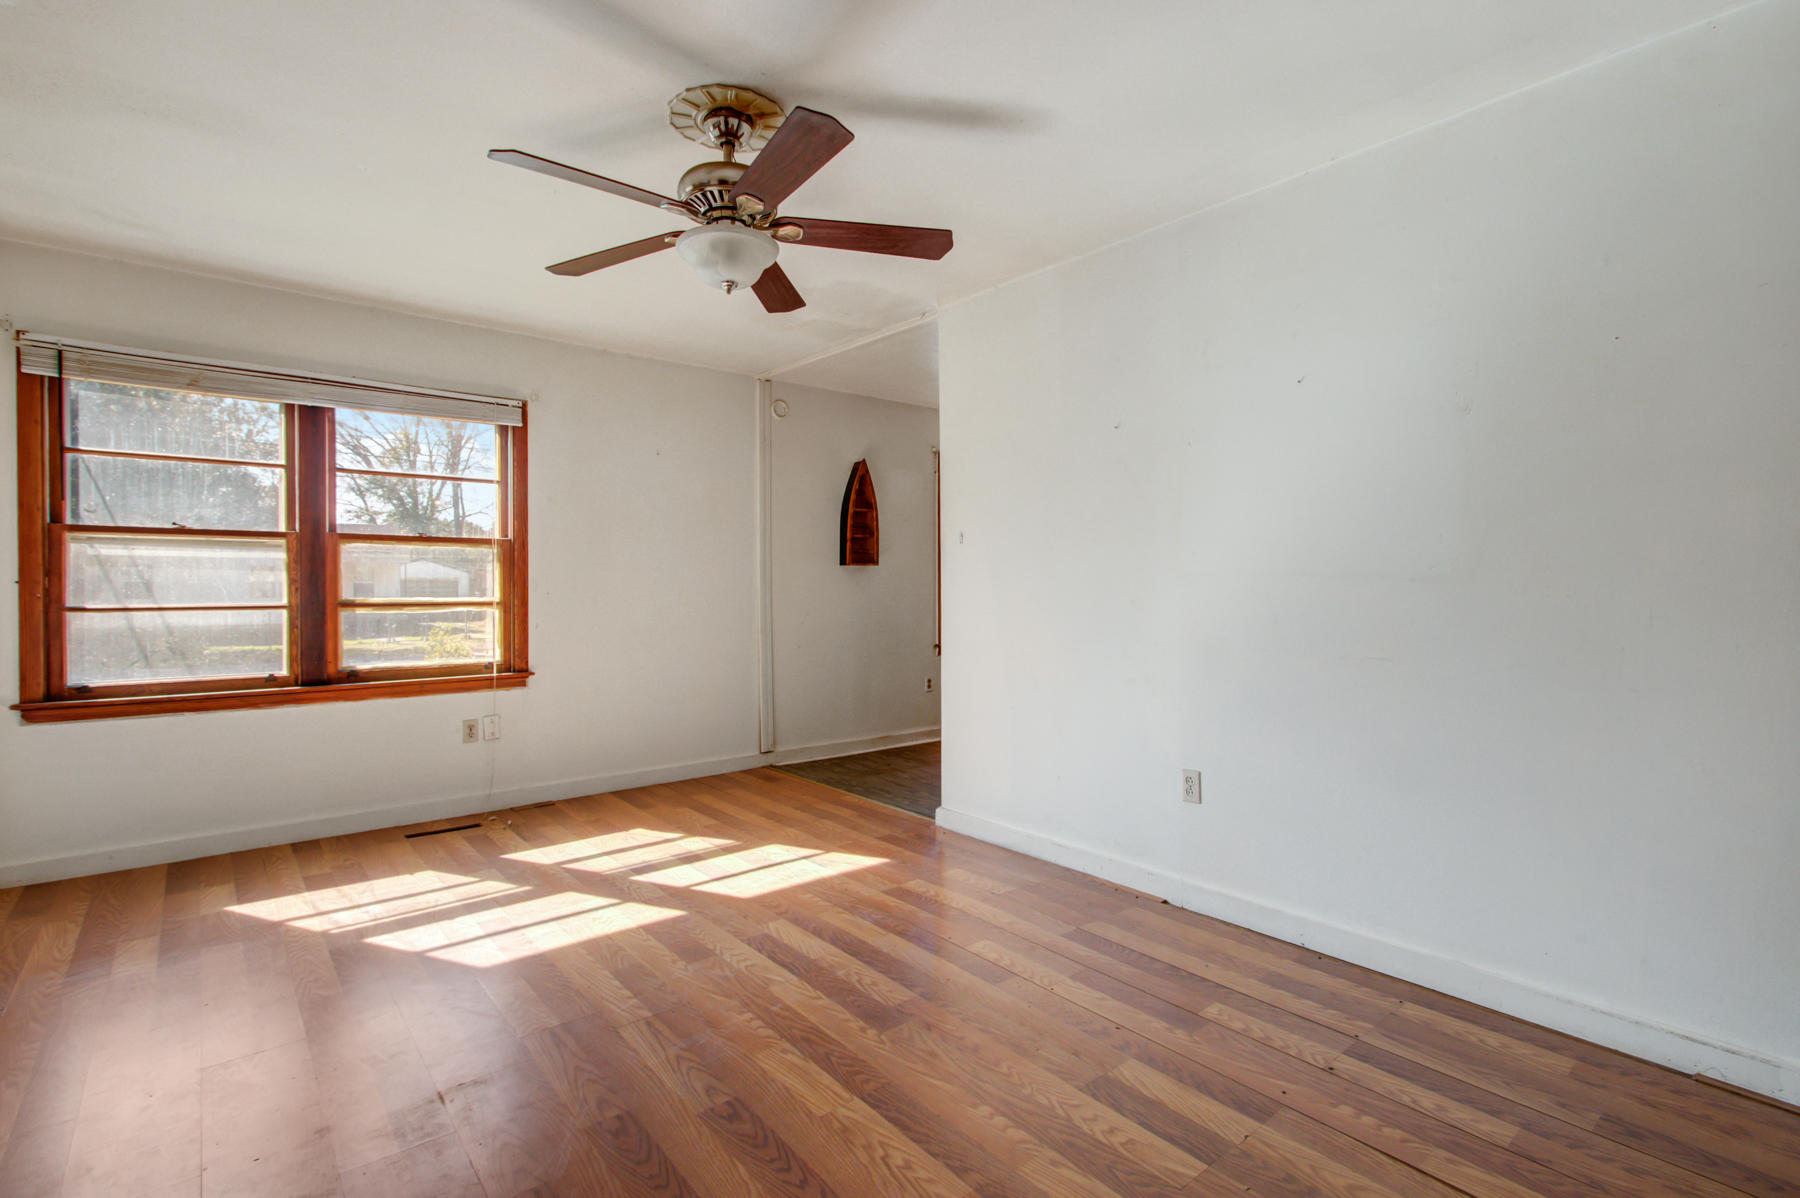 Port Park Homes For Sale - 5814 Moore, Hanahan, SC - 21